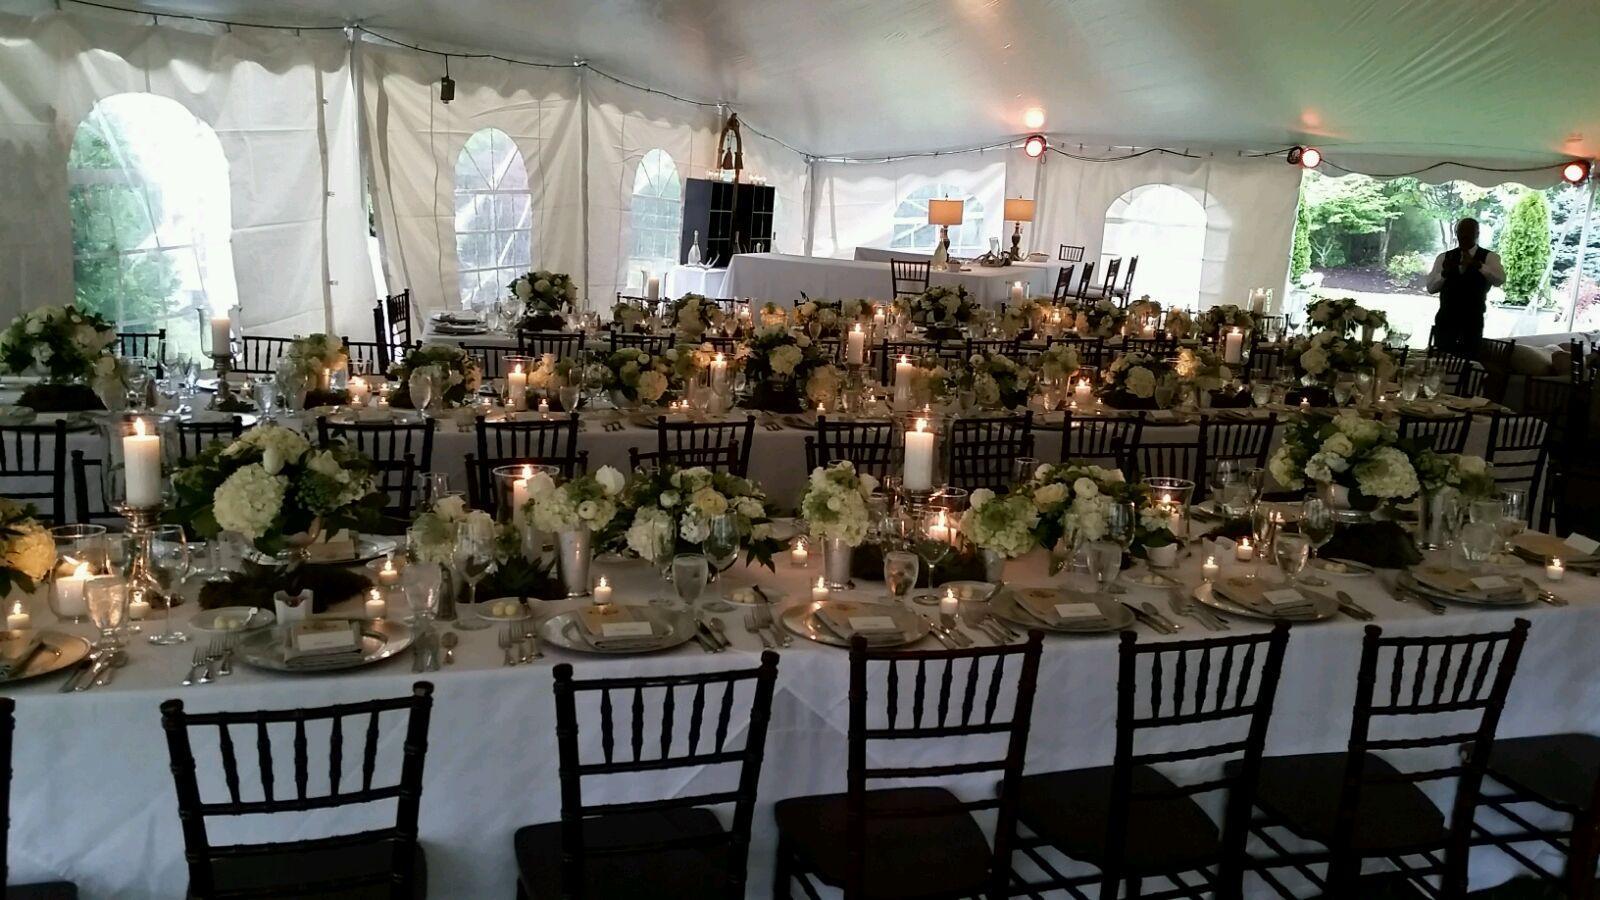 Hershey PA Wedding rentals